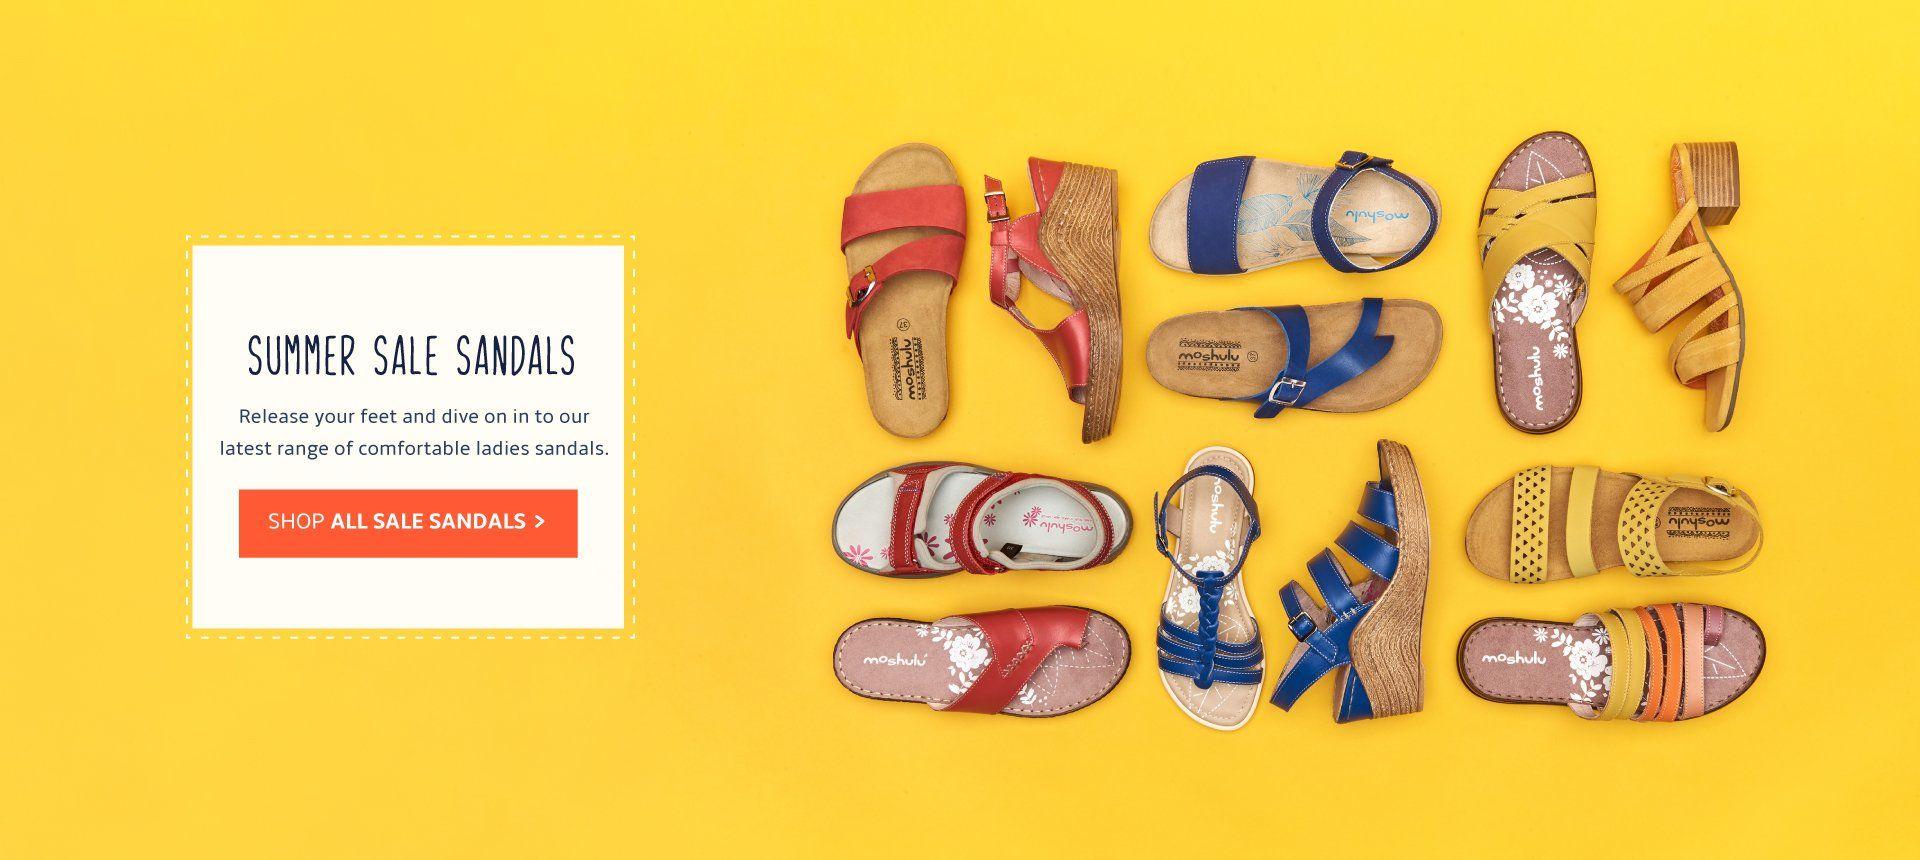 Summer Sale Sandals